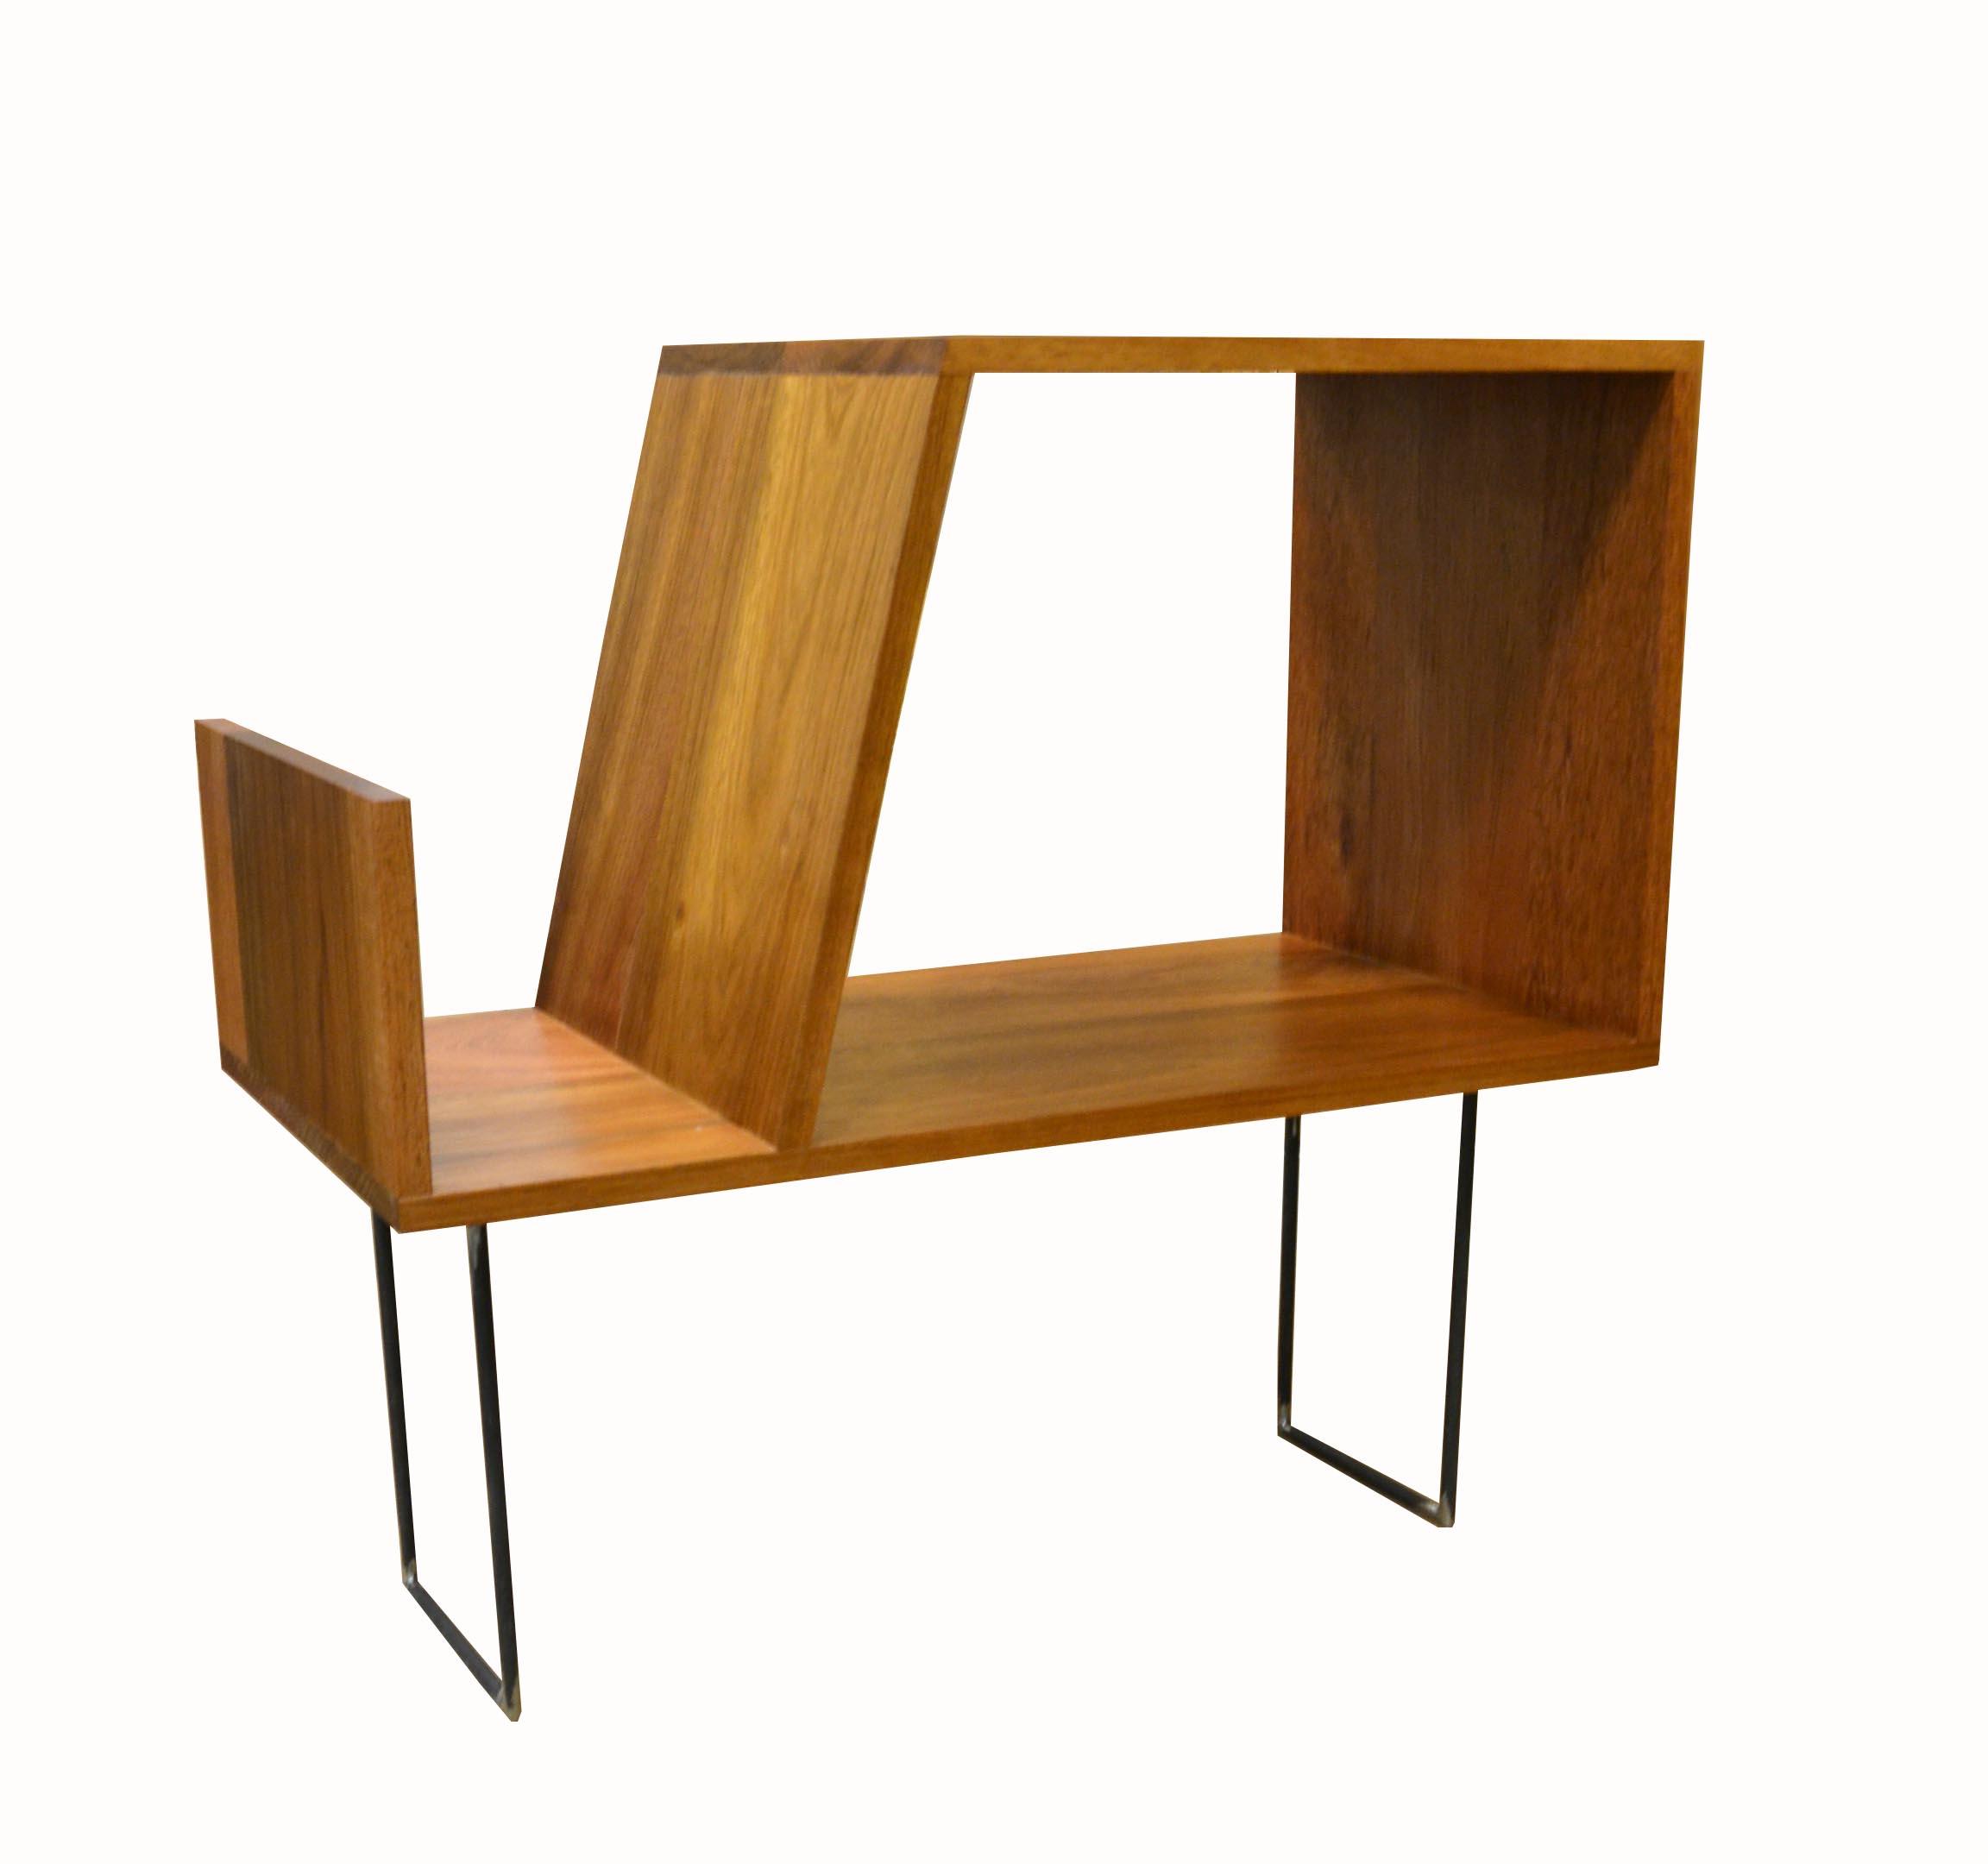 Mueble de jatoba